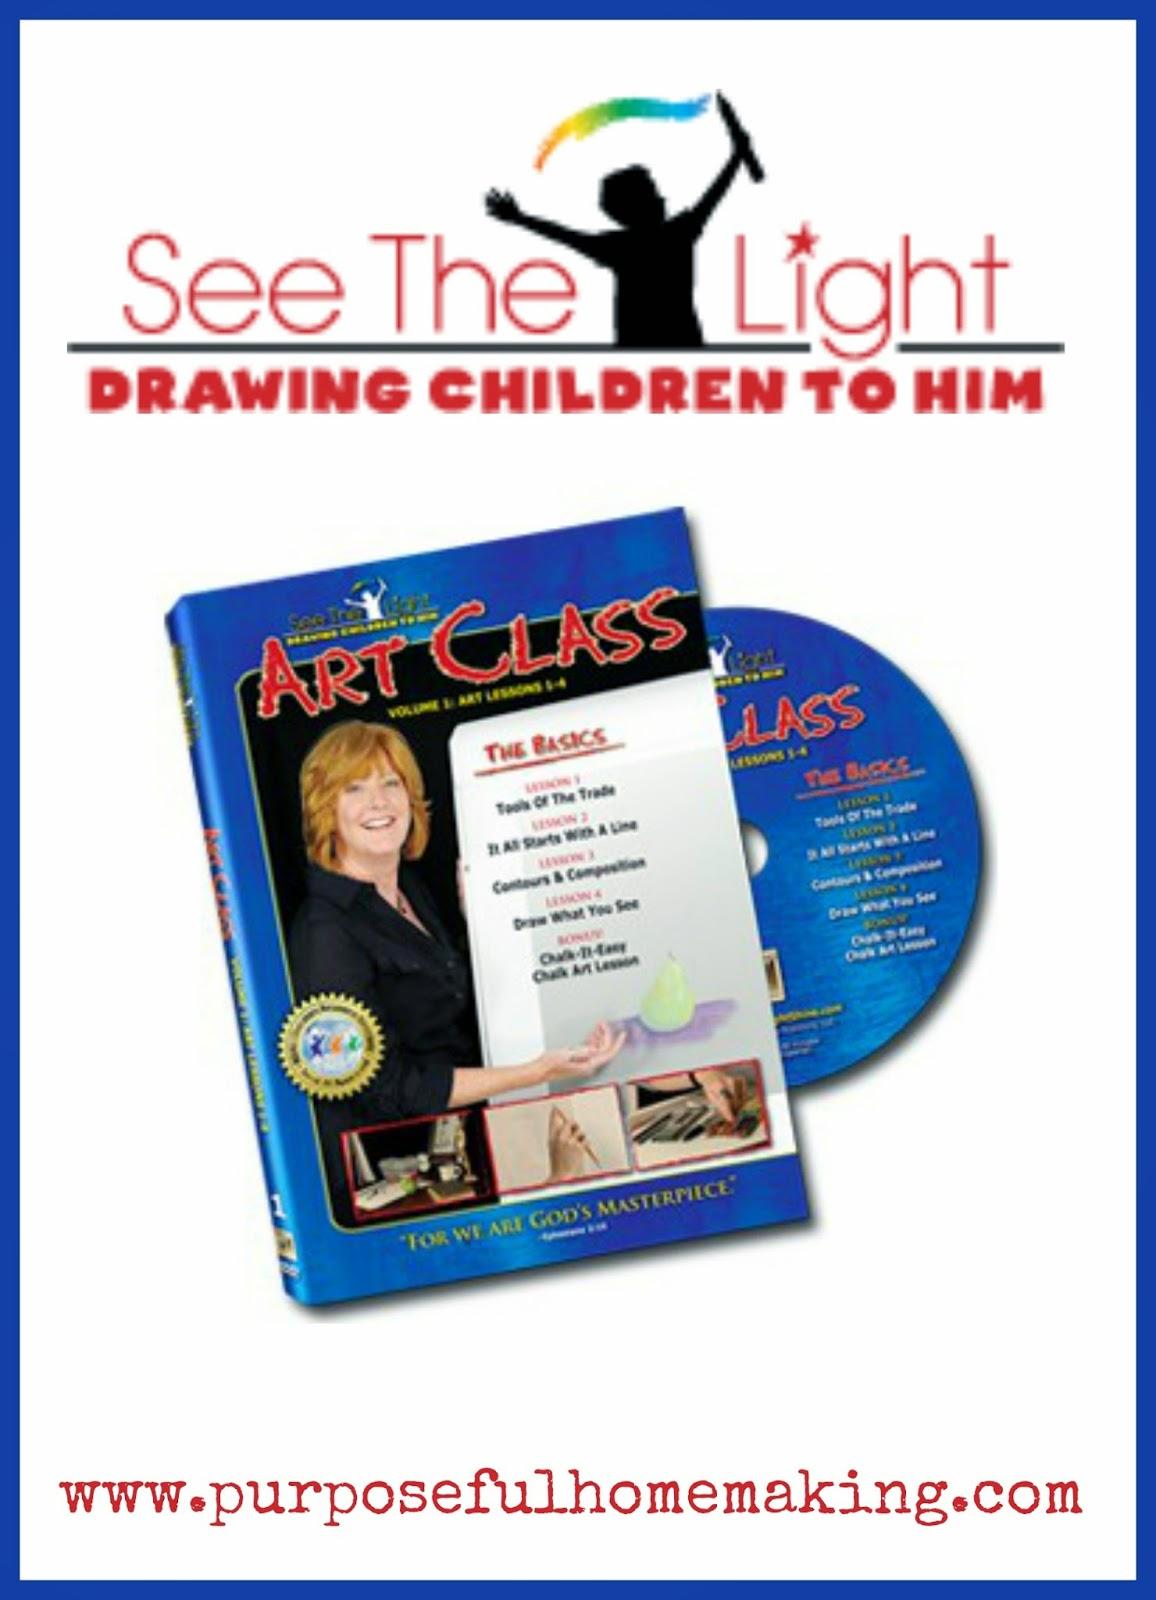 http://www.seethelightshine.com/store/art-class-dvds/art-class-dvd-volume-1-free-shipping.html